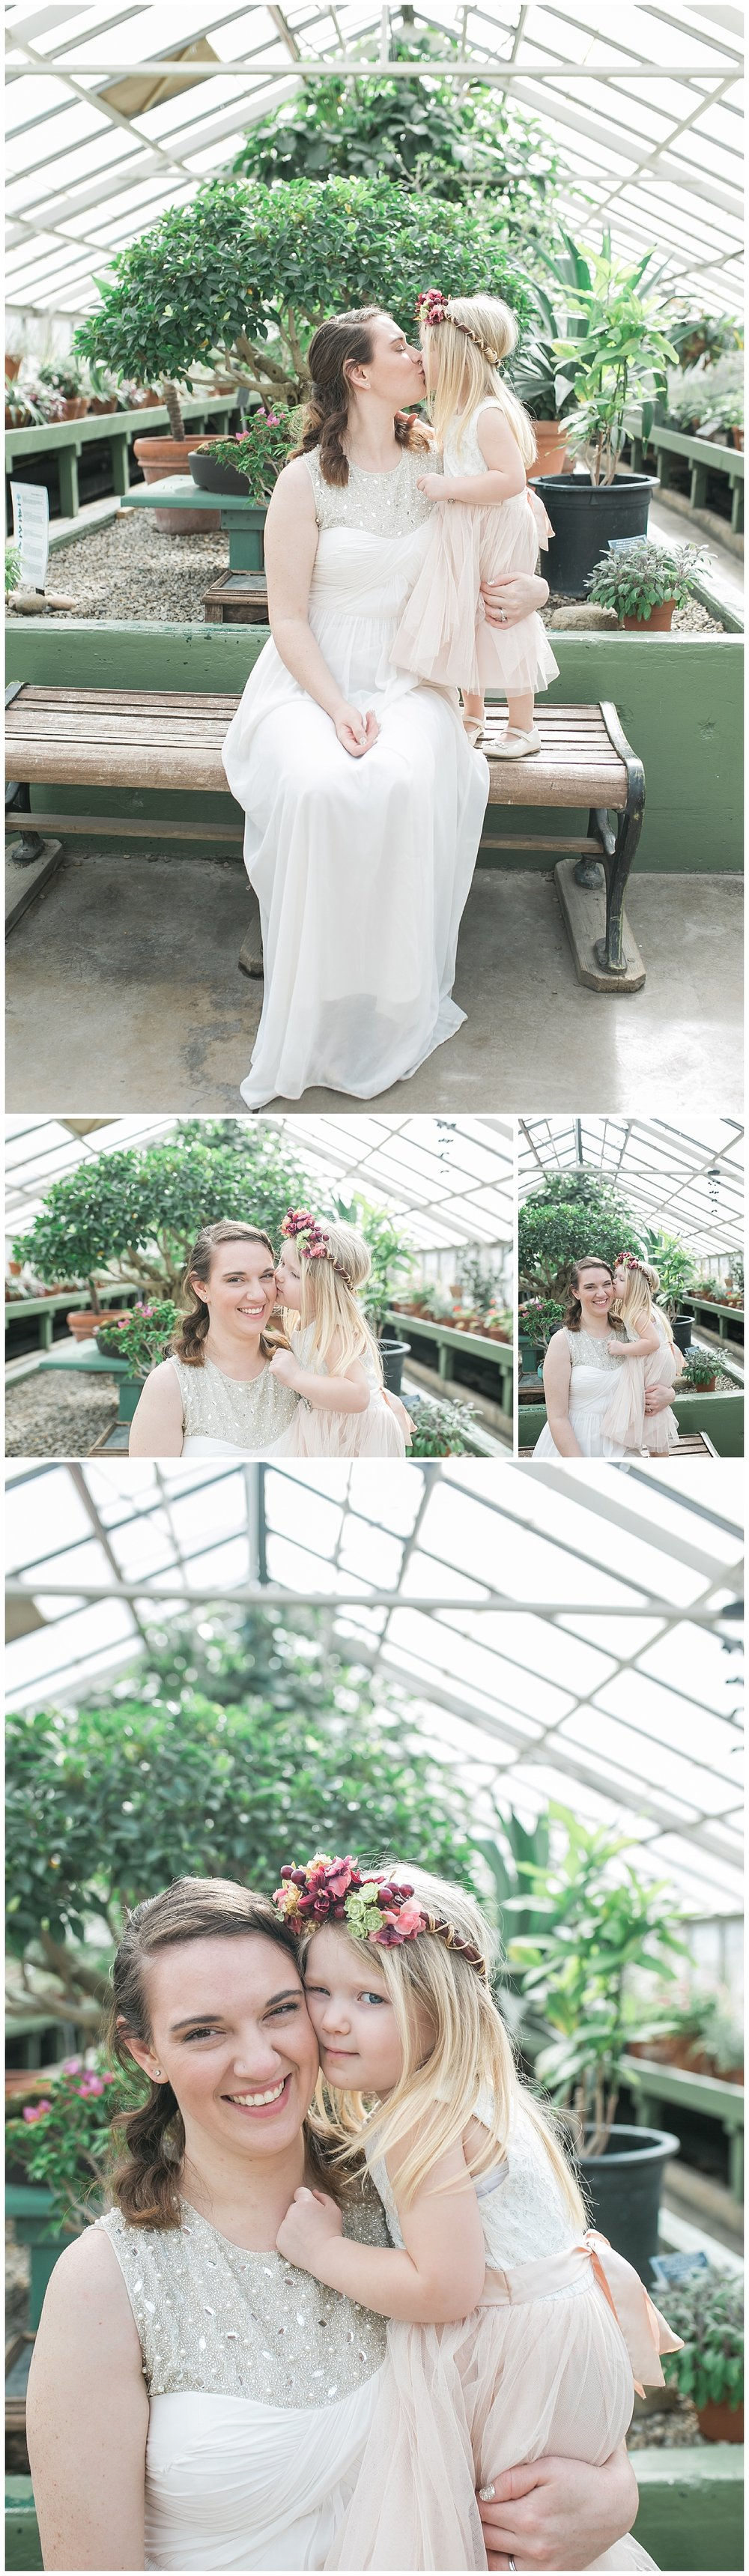 Buffalo Botanical gardens wedding - Buffalo NY Lass and Beau 44.jpg